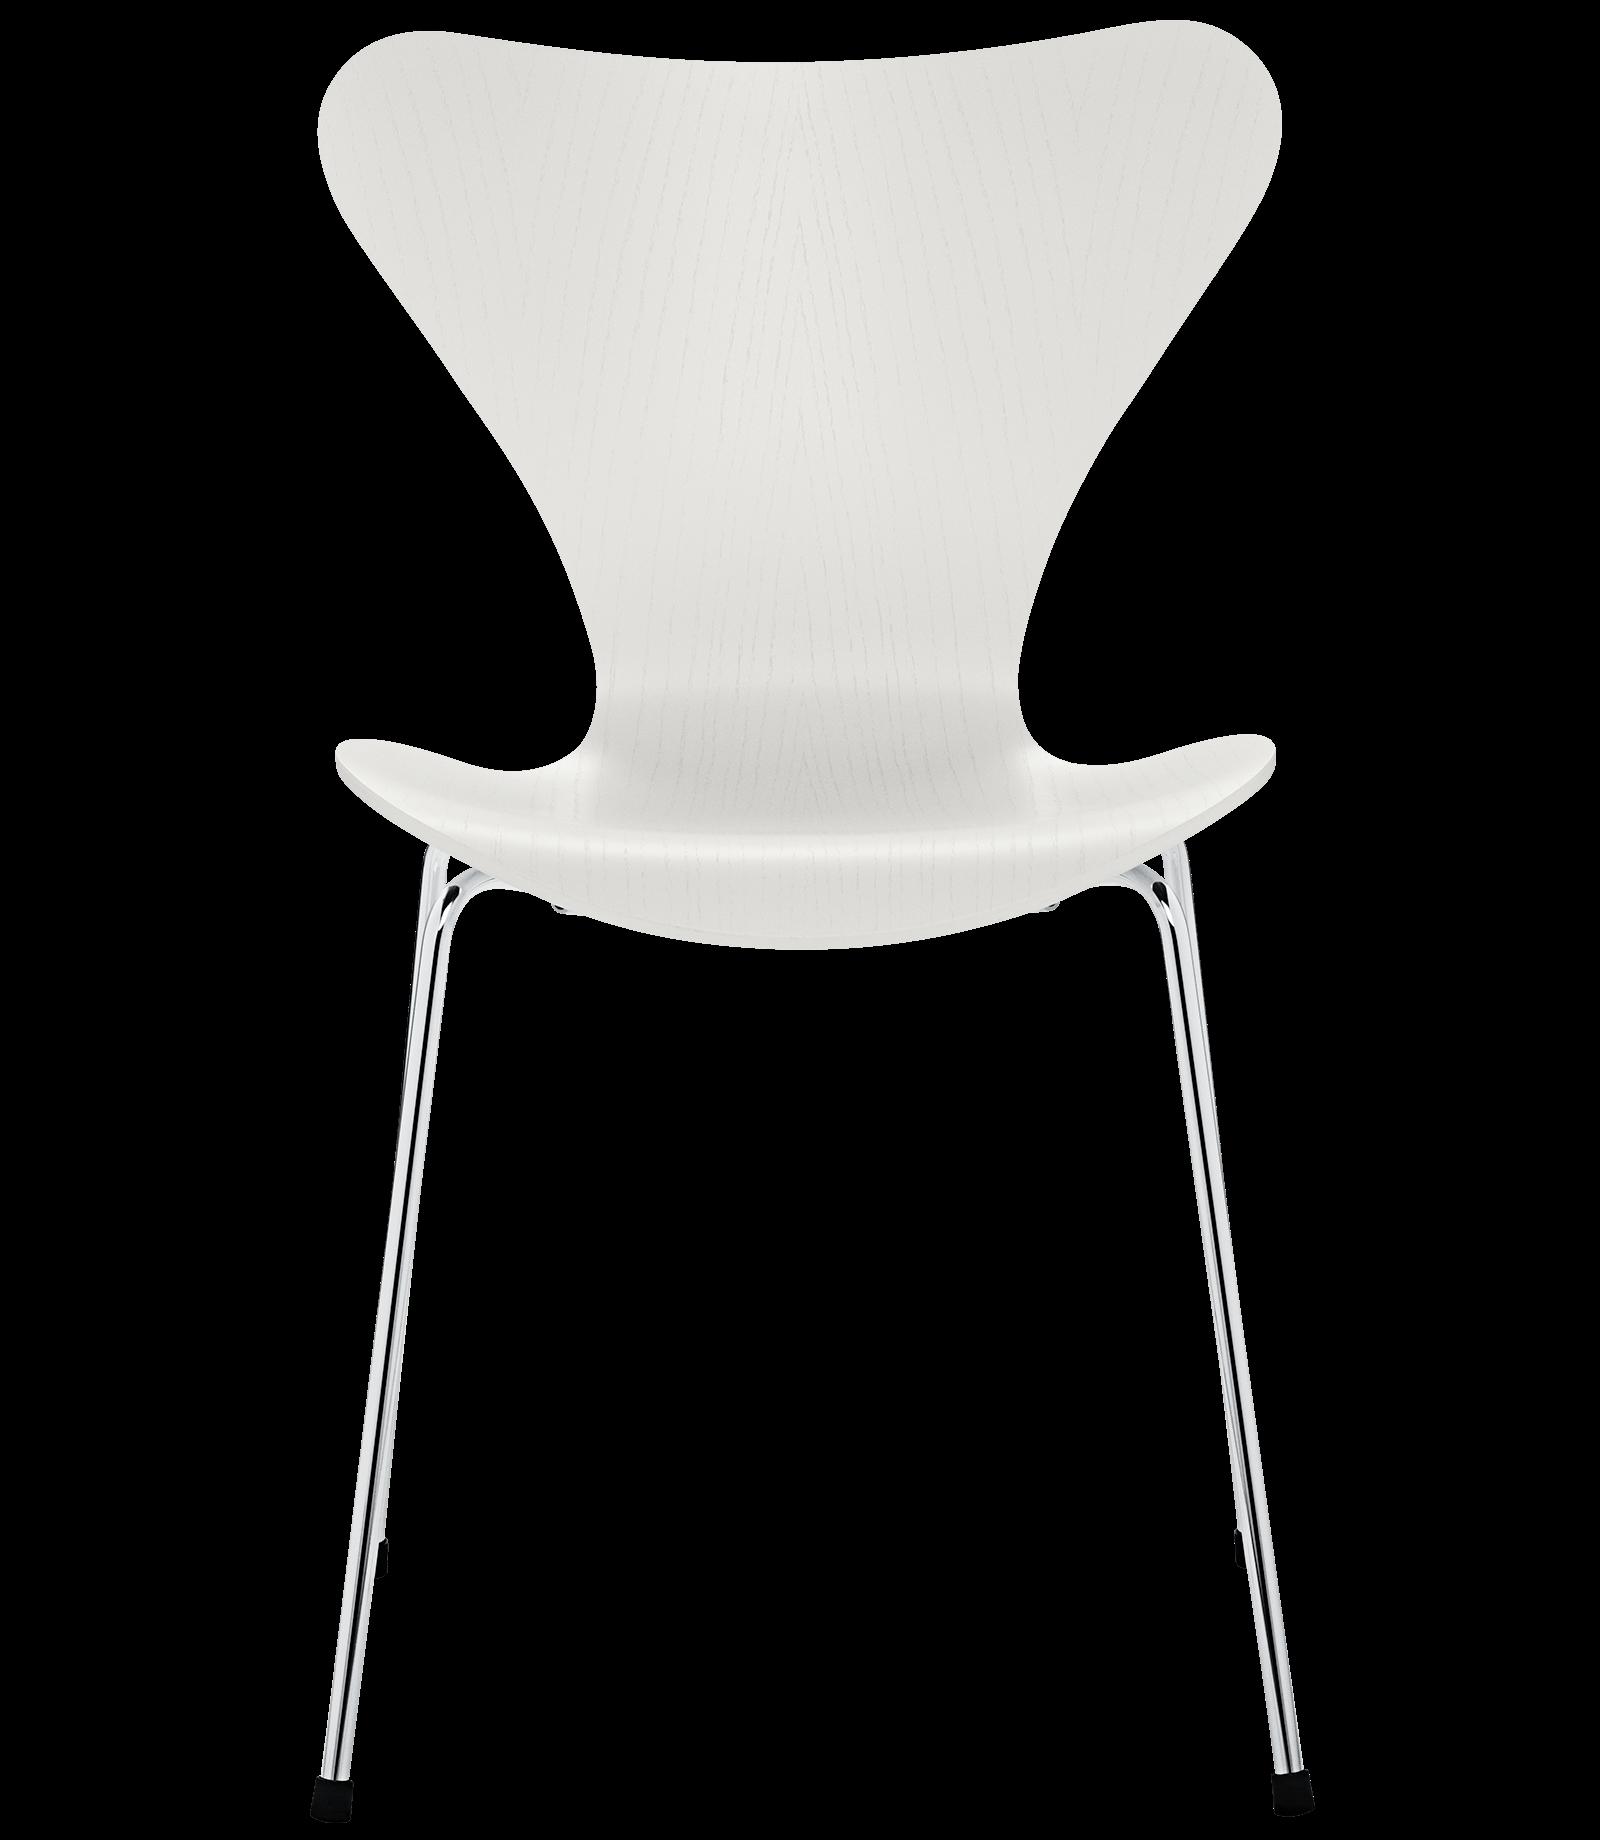 fritz hansen series 7 eldh sst lar innanh ss chair. Black Bedroom Furniture Sets. Home Design Ideas